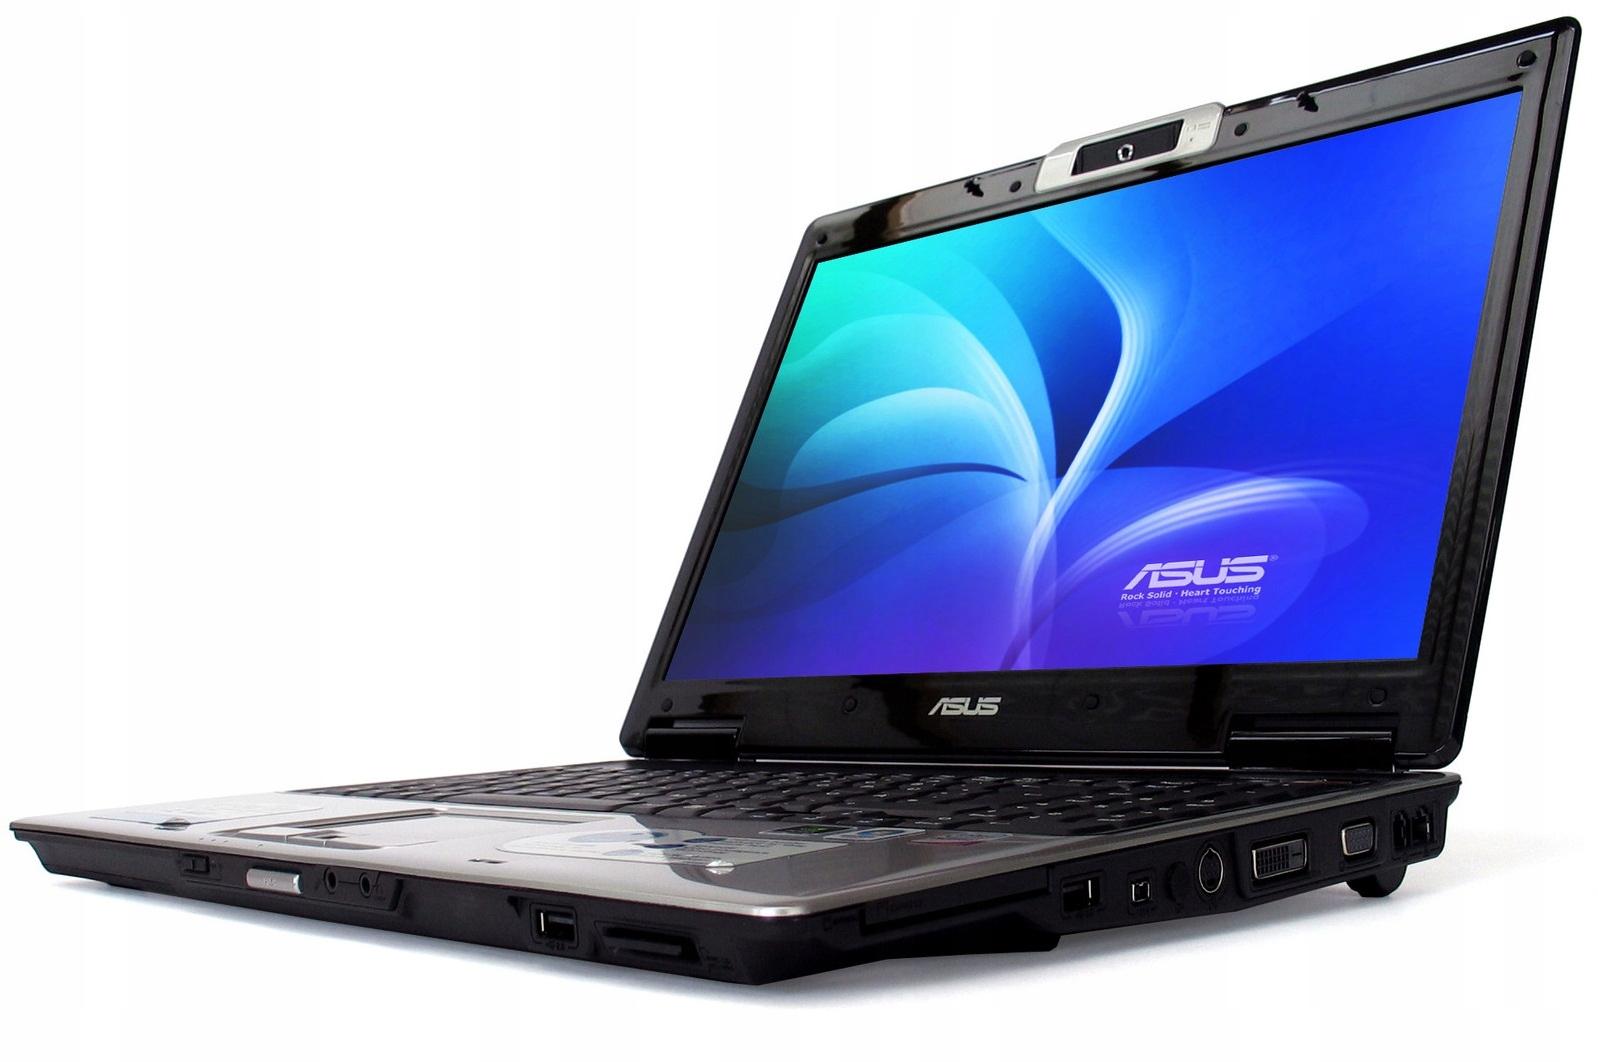 BATERIA AKUMULATOR ASUS F3 F3E F3F F3J F3S F3SG F2 M5 A32-F3 - Baterie do laptopów